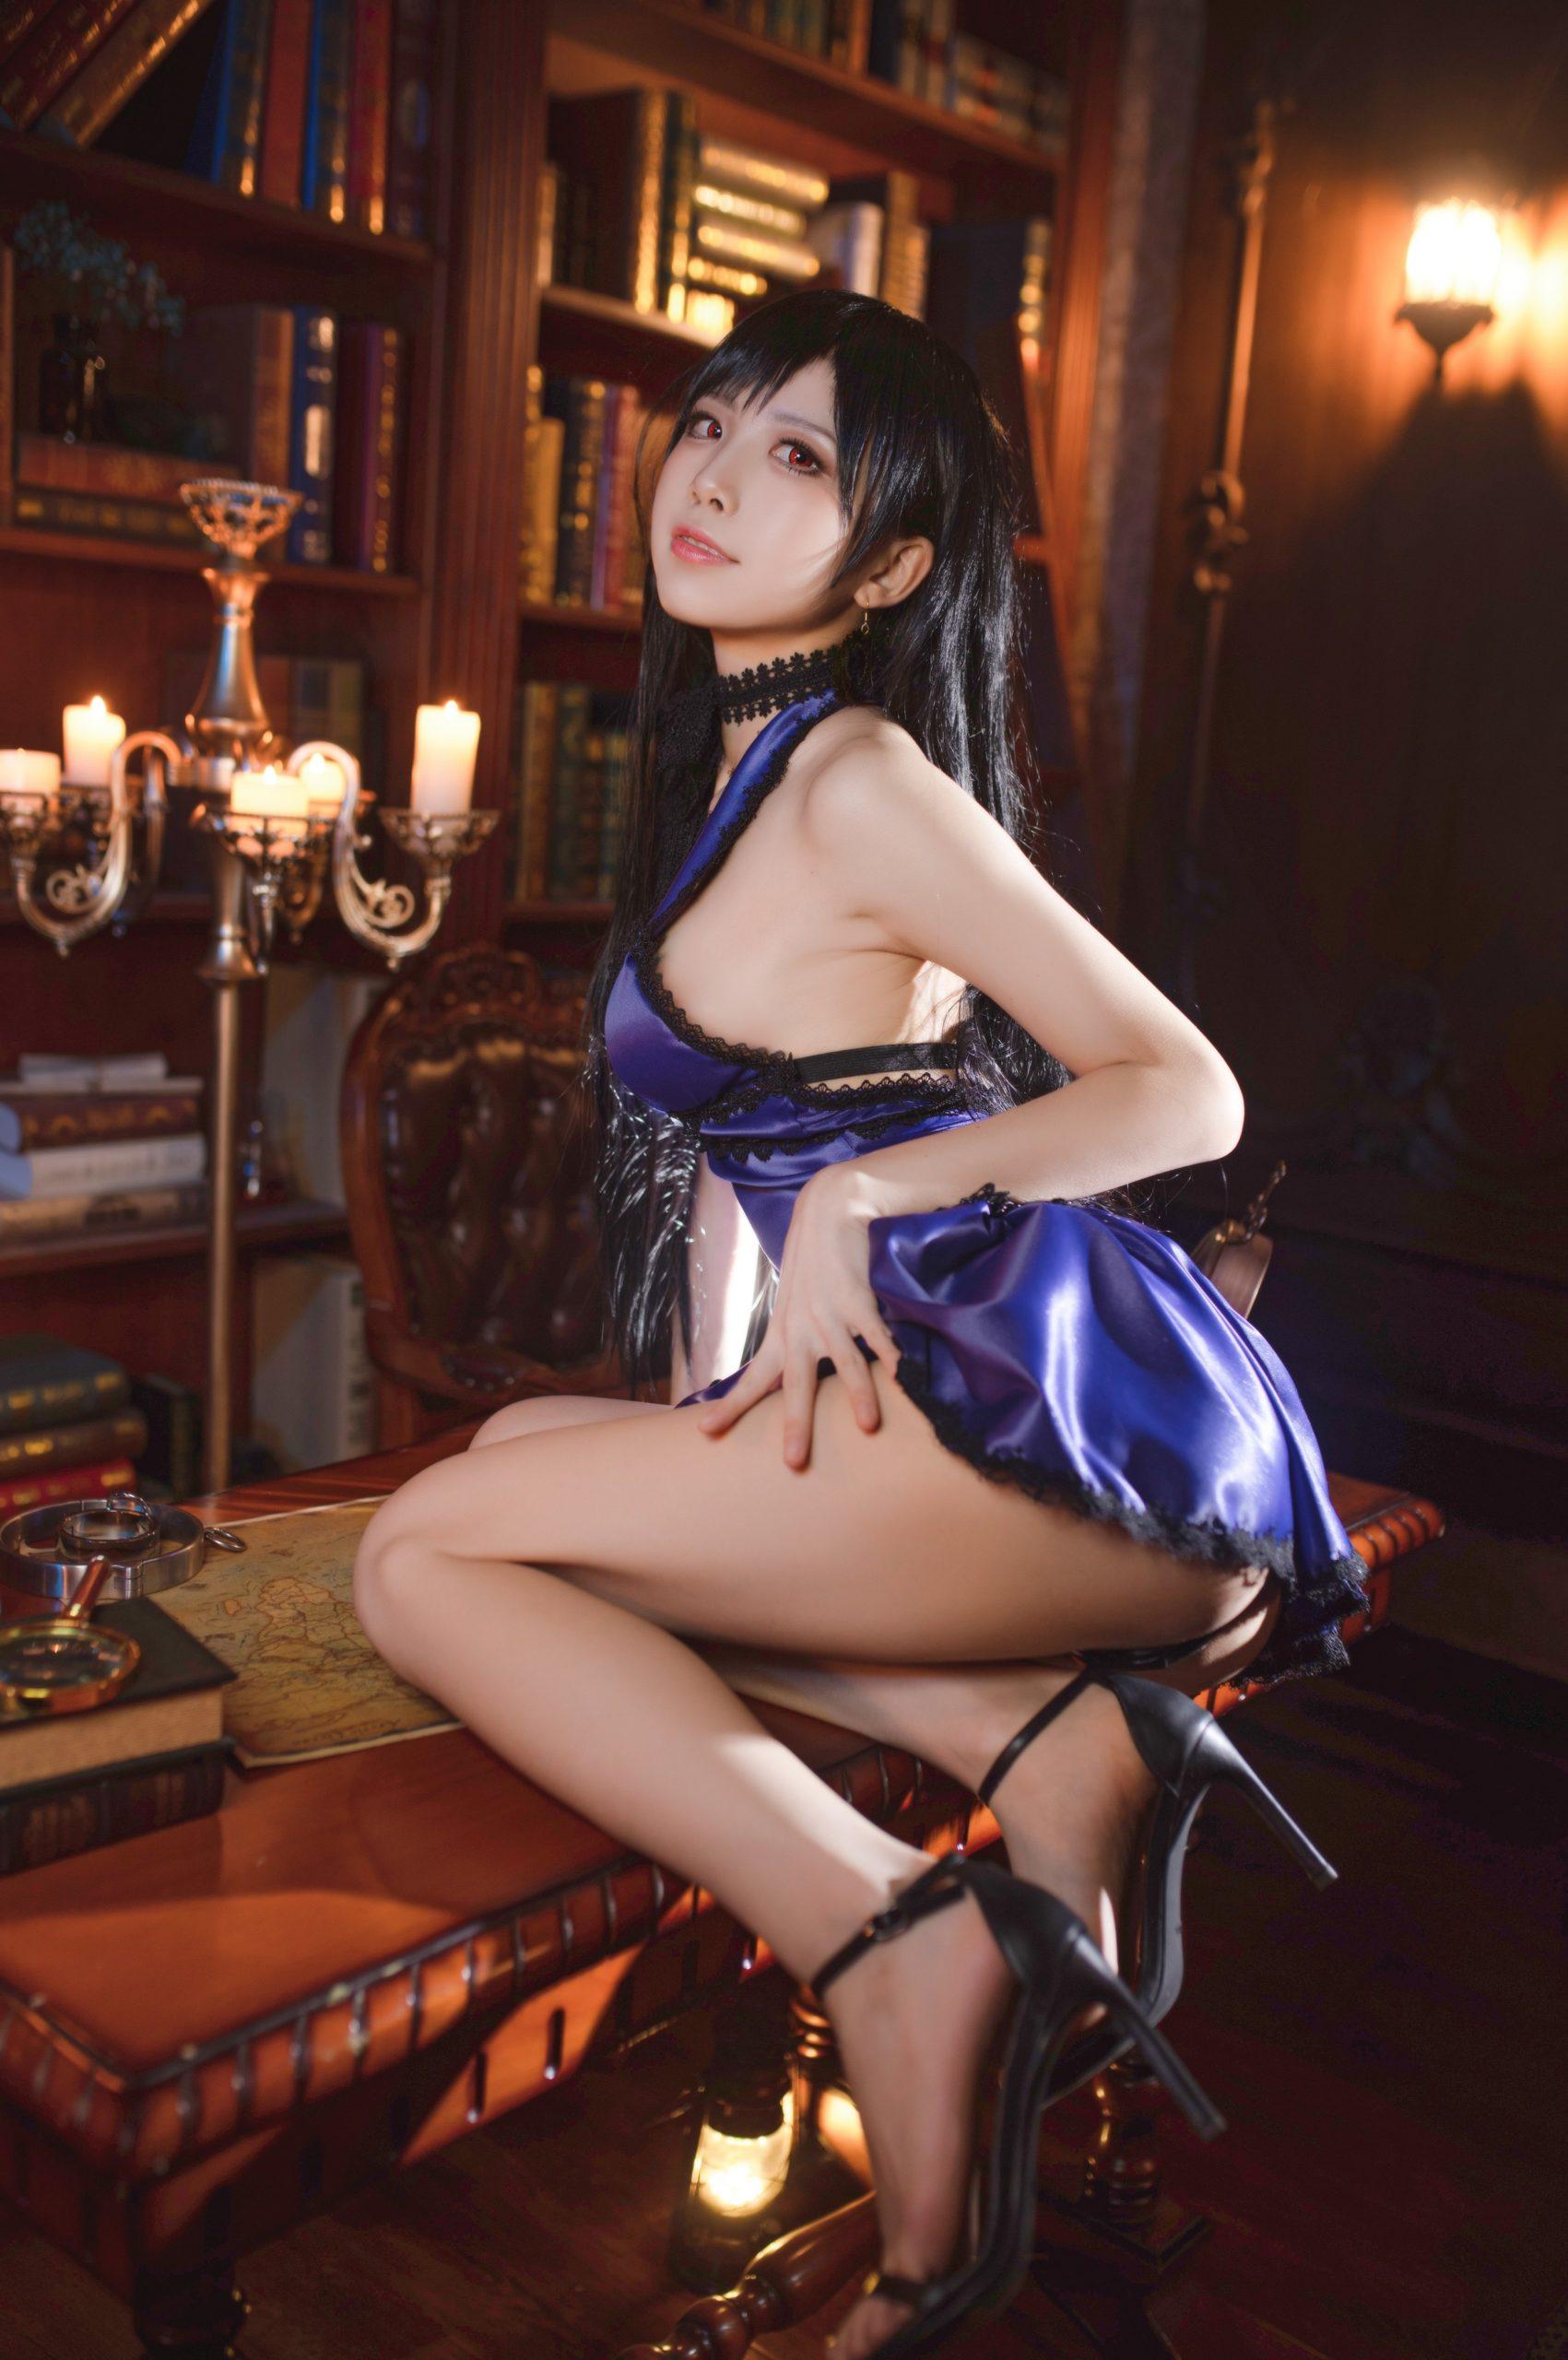 Final Fantasy VII Tifa Lockhart Night Dress Cosplay by Aqua Quite Inviting 8